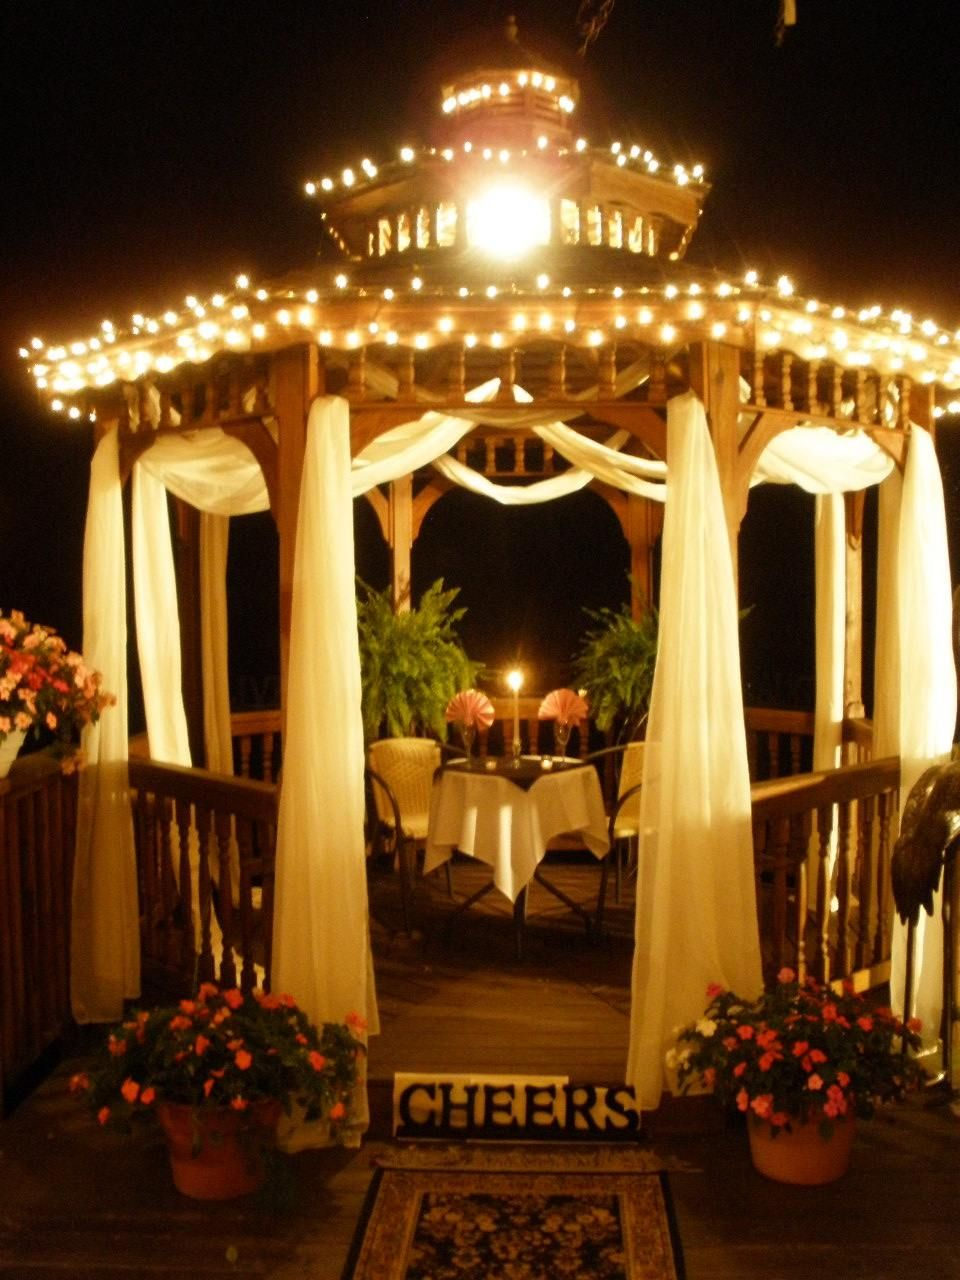 Cheers Chalet Gazebo Decorations Gazebo Wedding Decorations